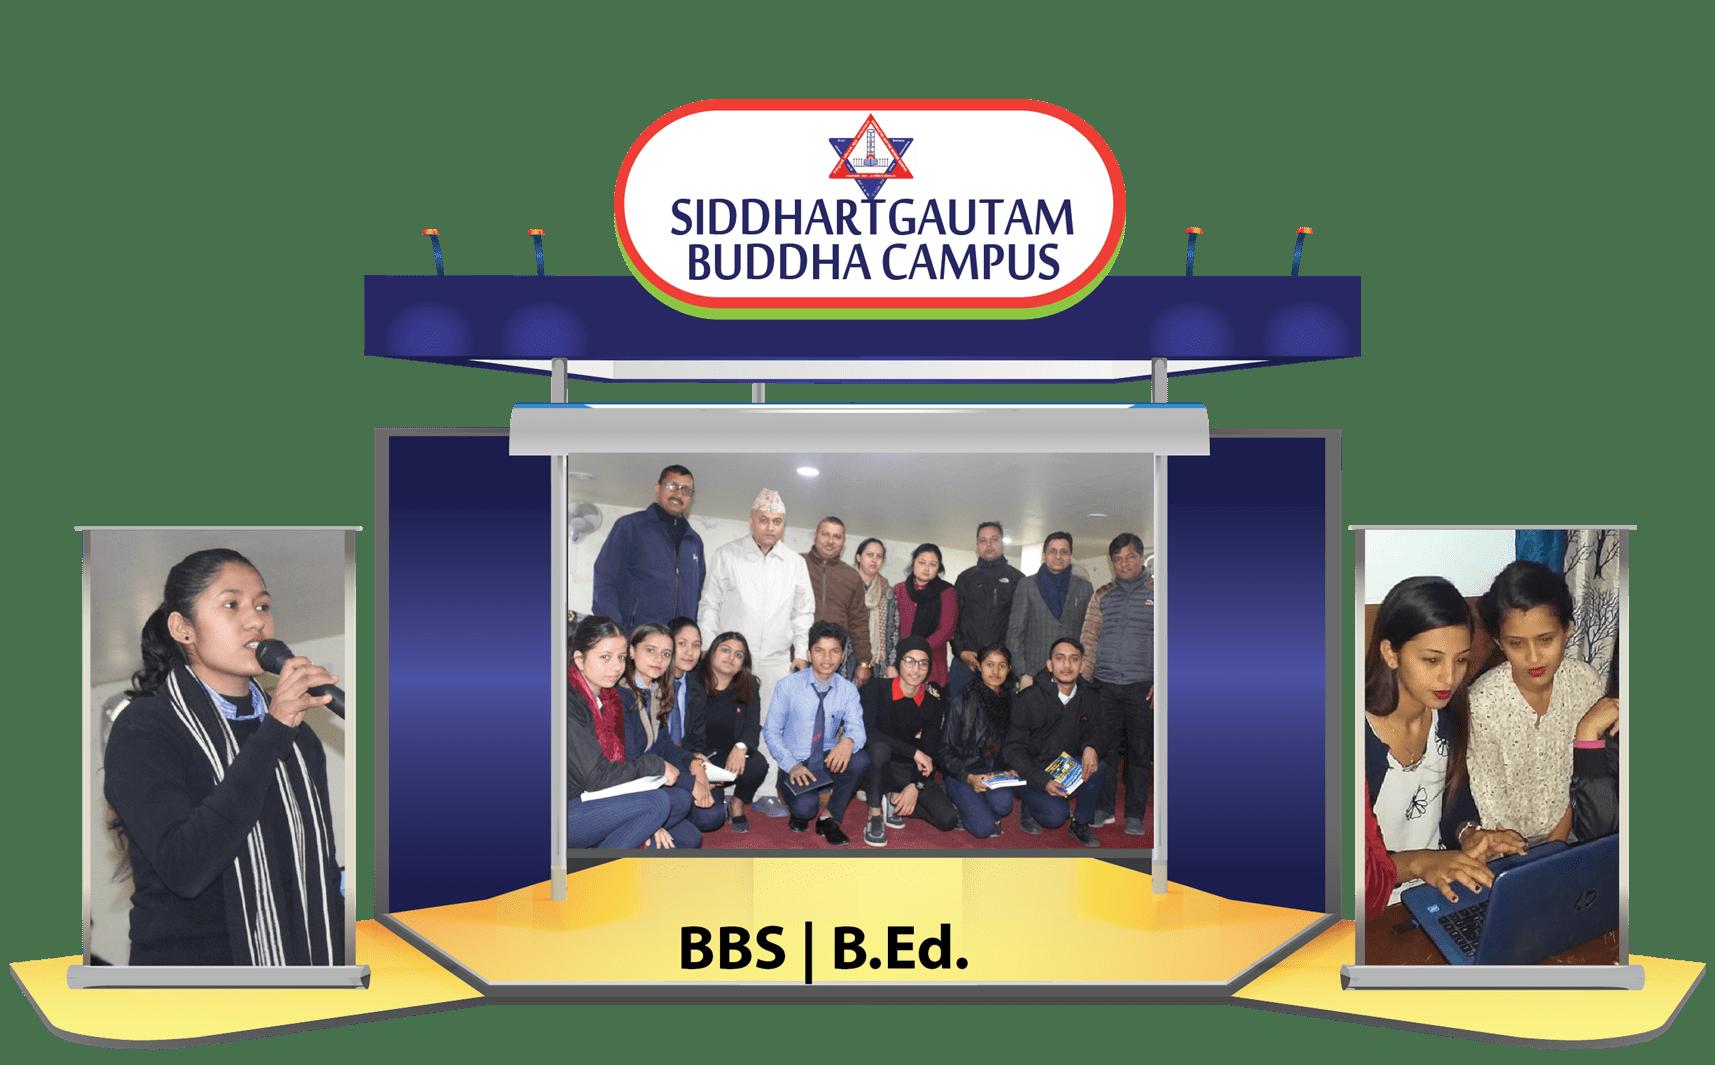 Siddhartha Guatam Buddha Campus